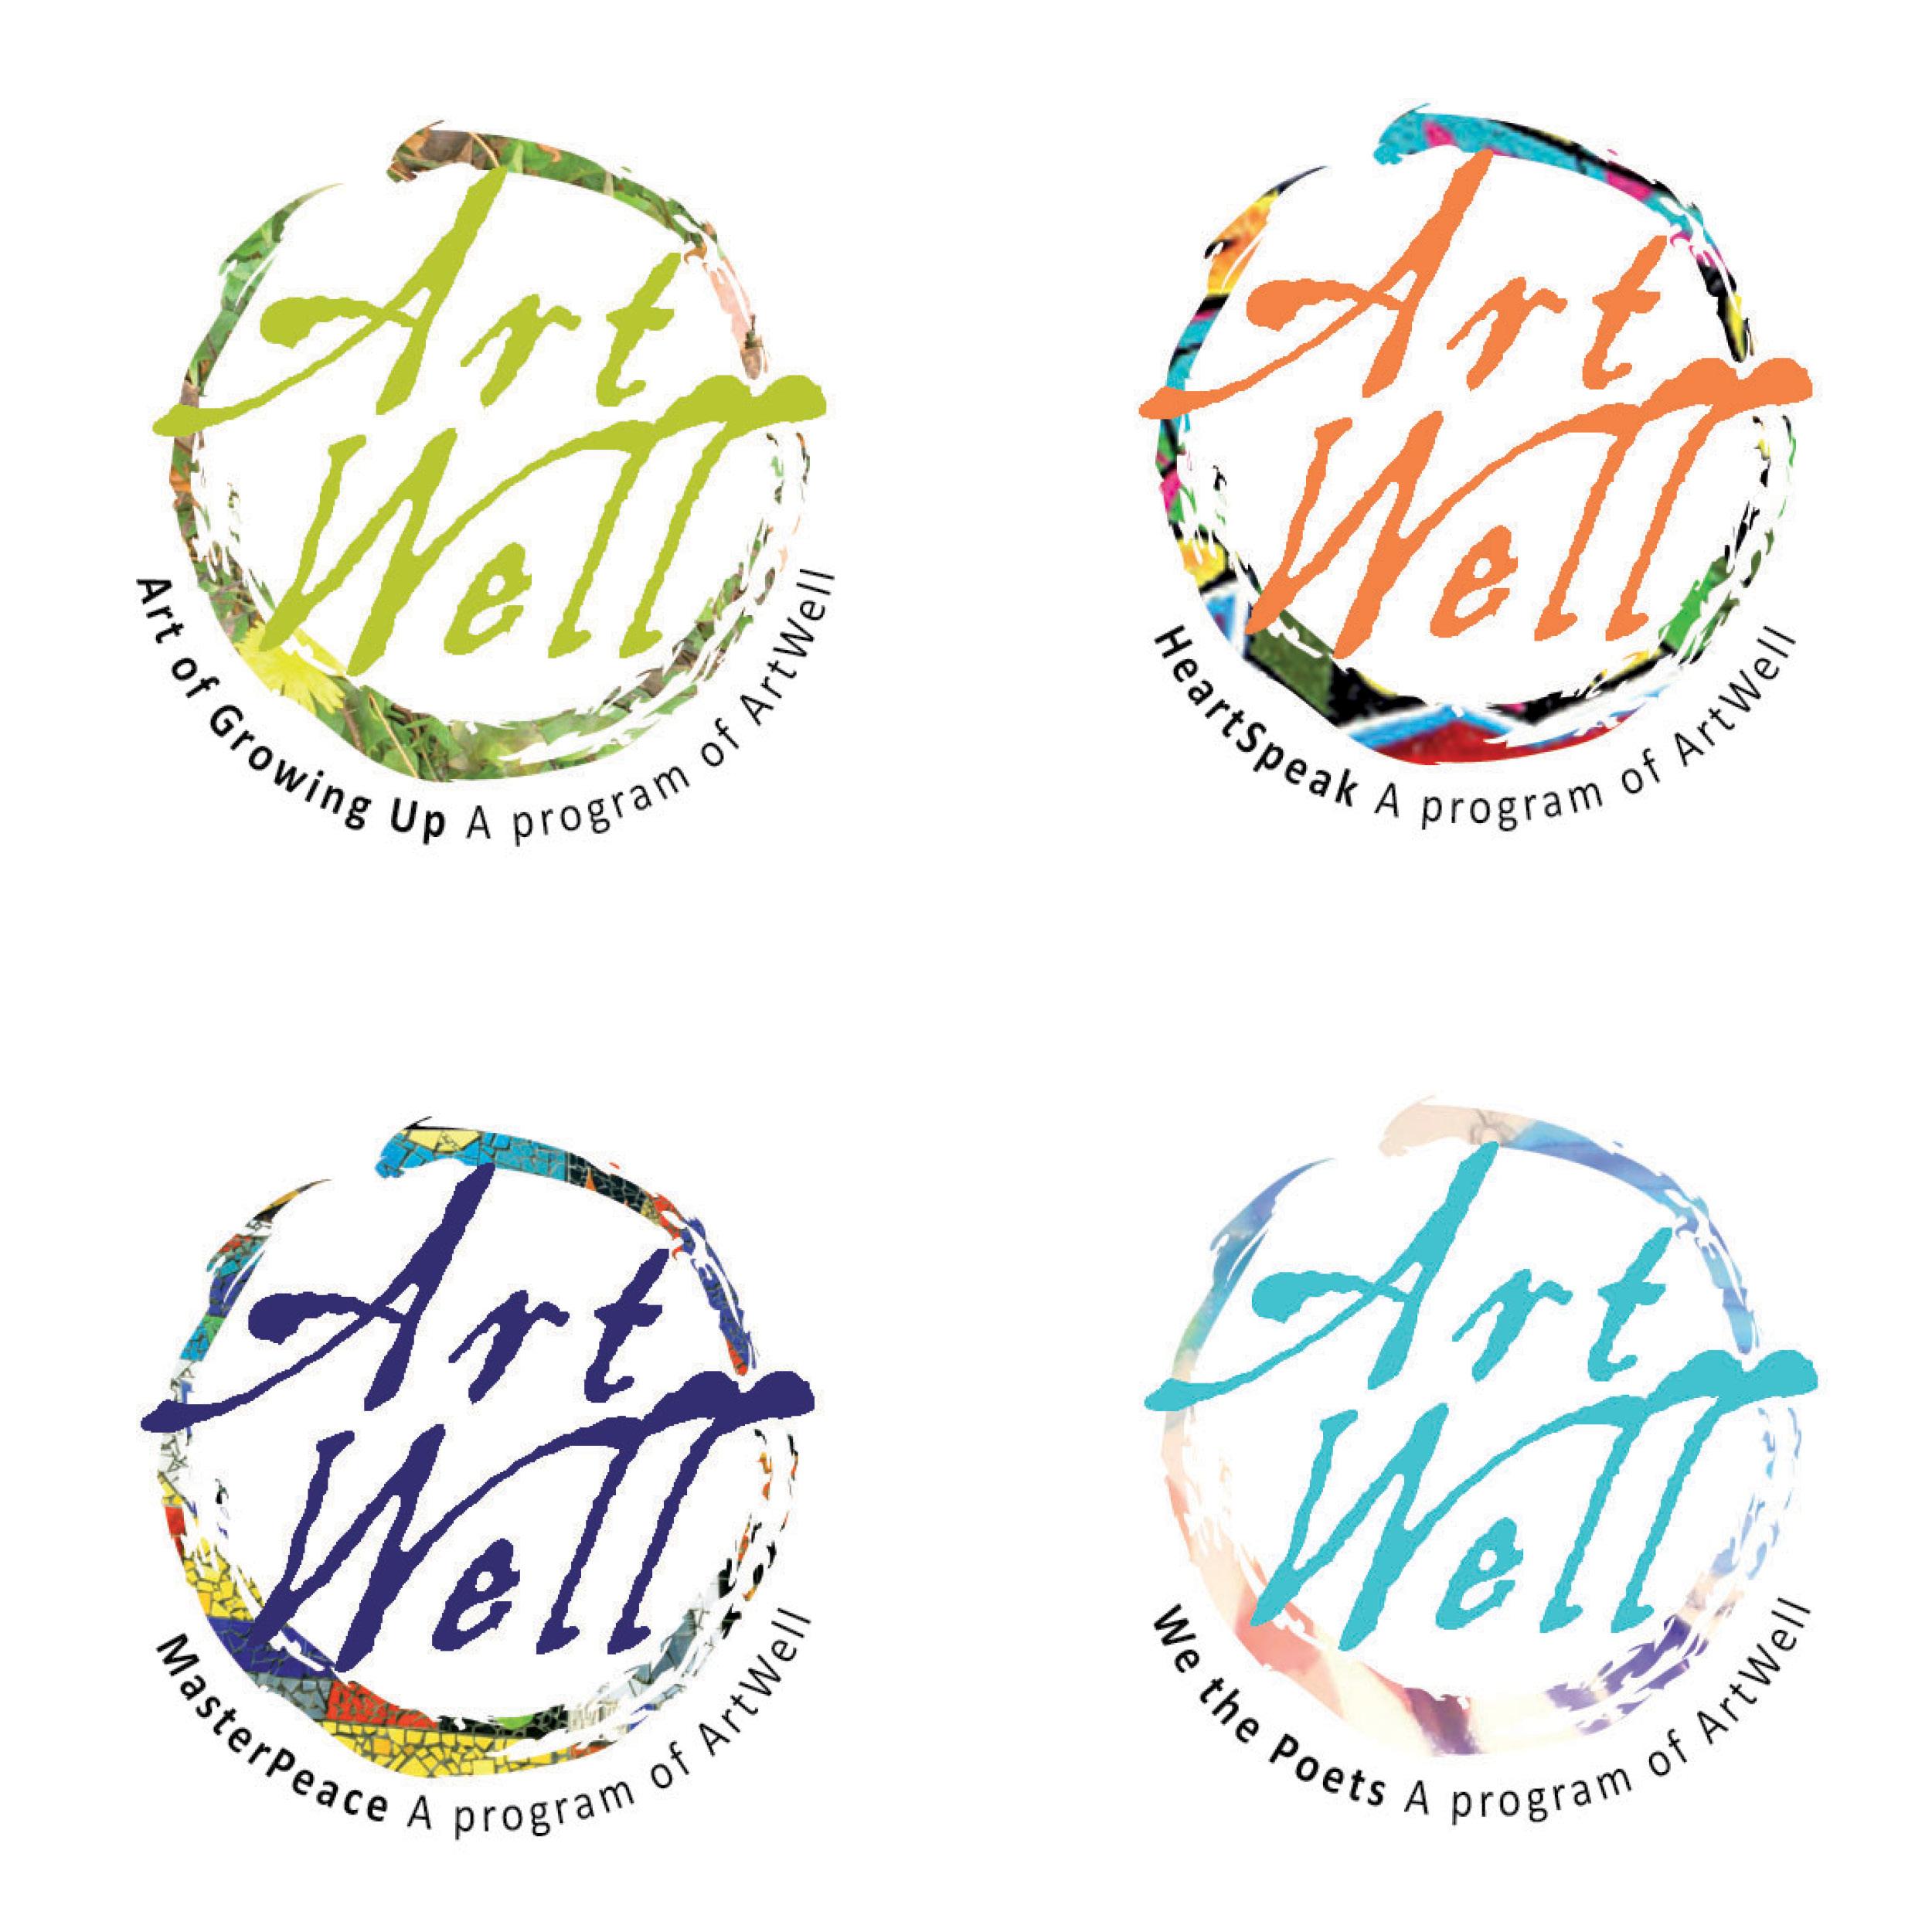 ArtWell program identities